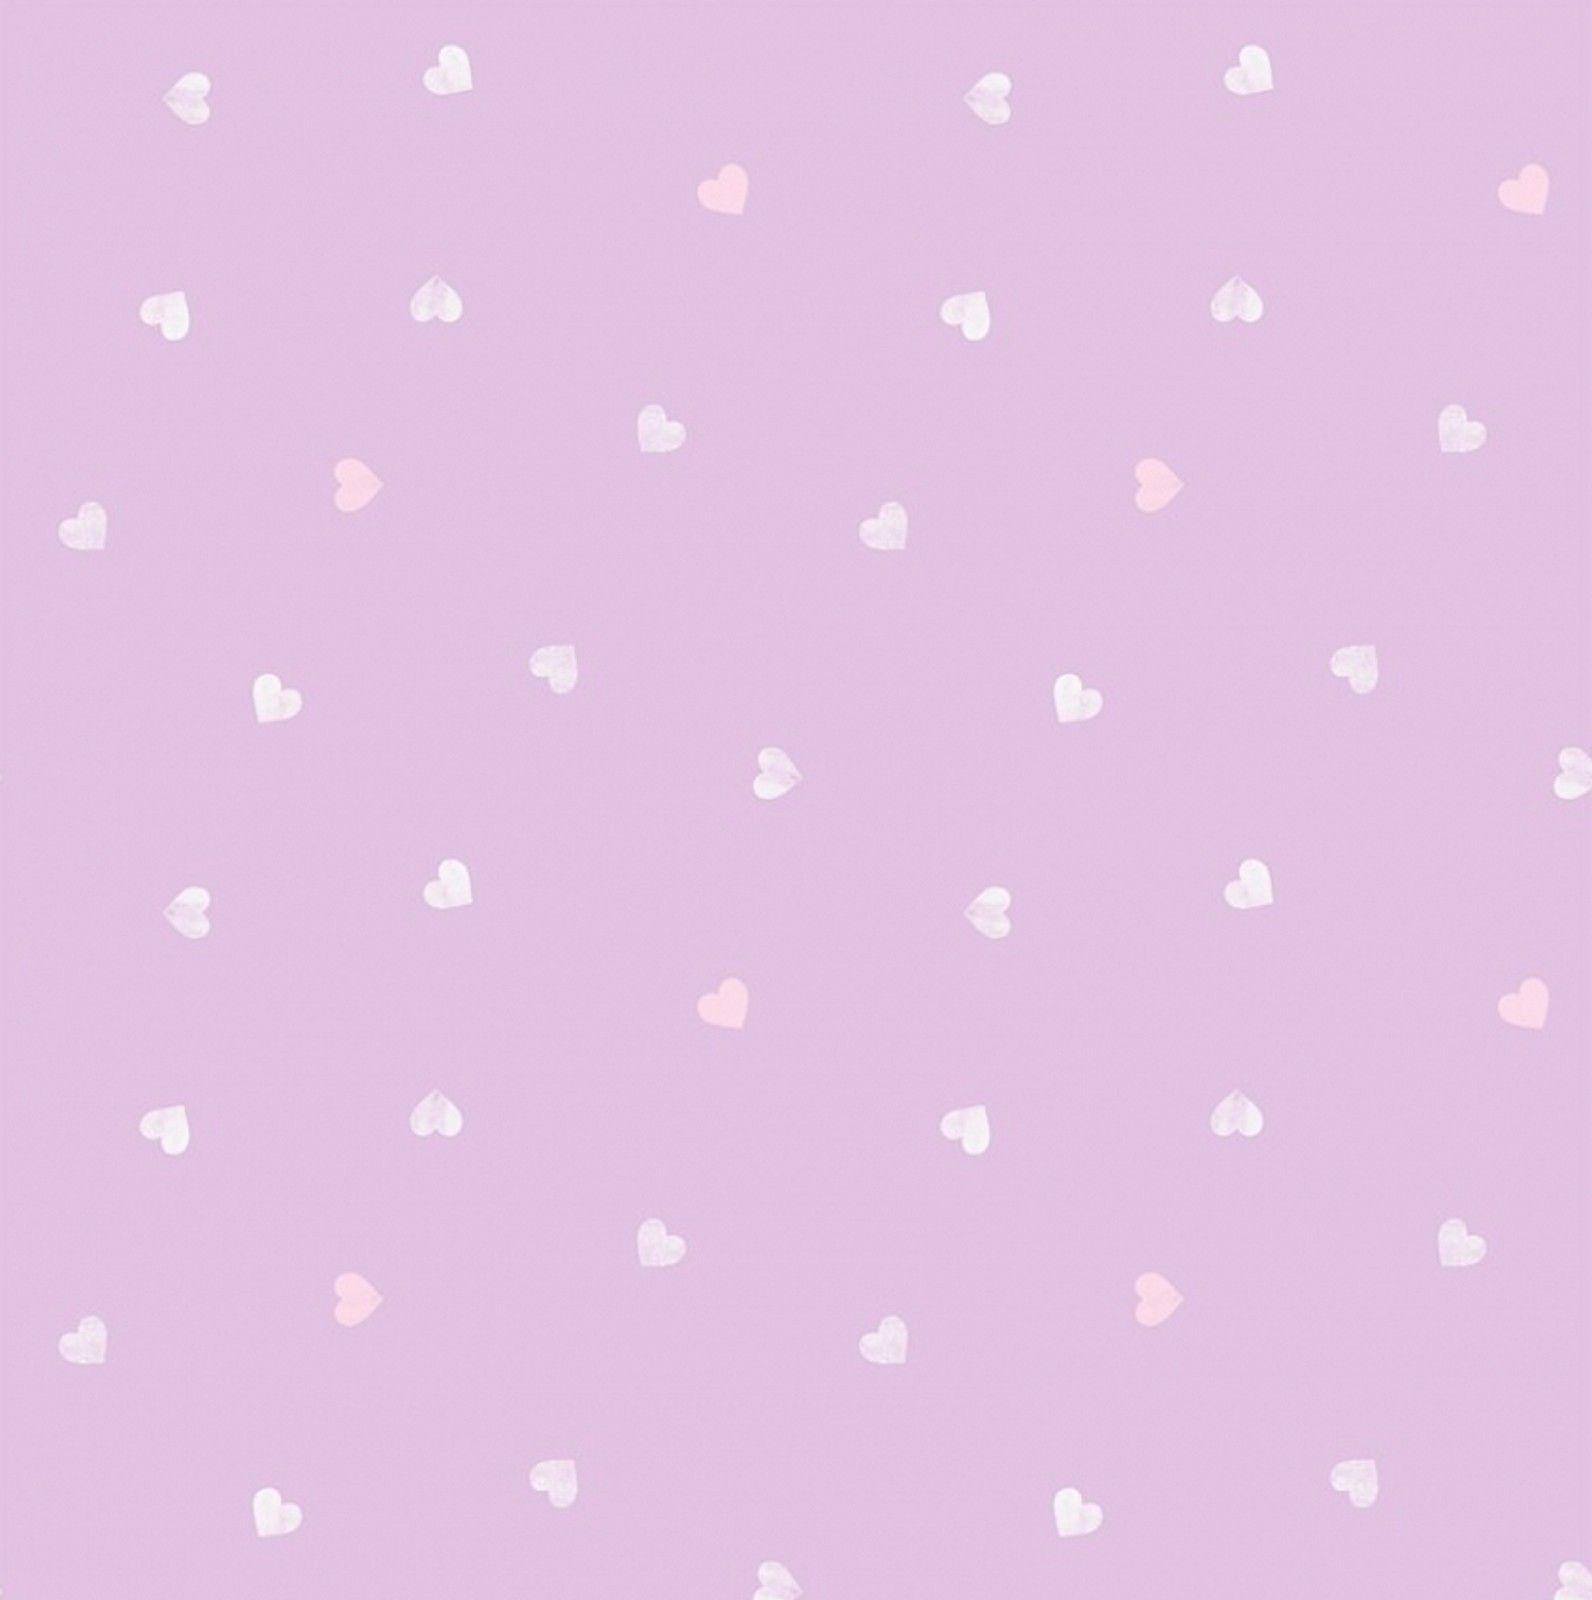 PURPLE LILAC LOVE HEARTS GIRLS CHILDRENS KIDS NURSERY BABY WALLPAPER DL21117